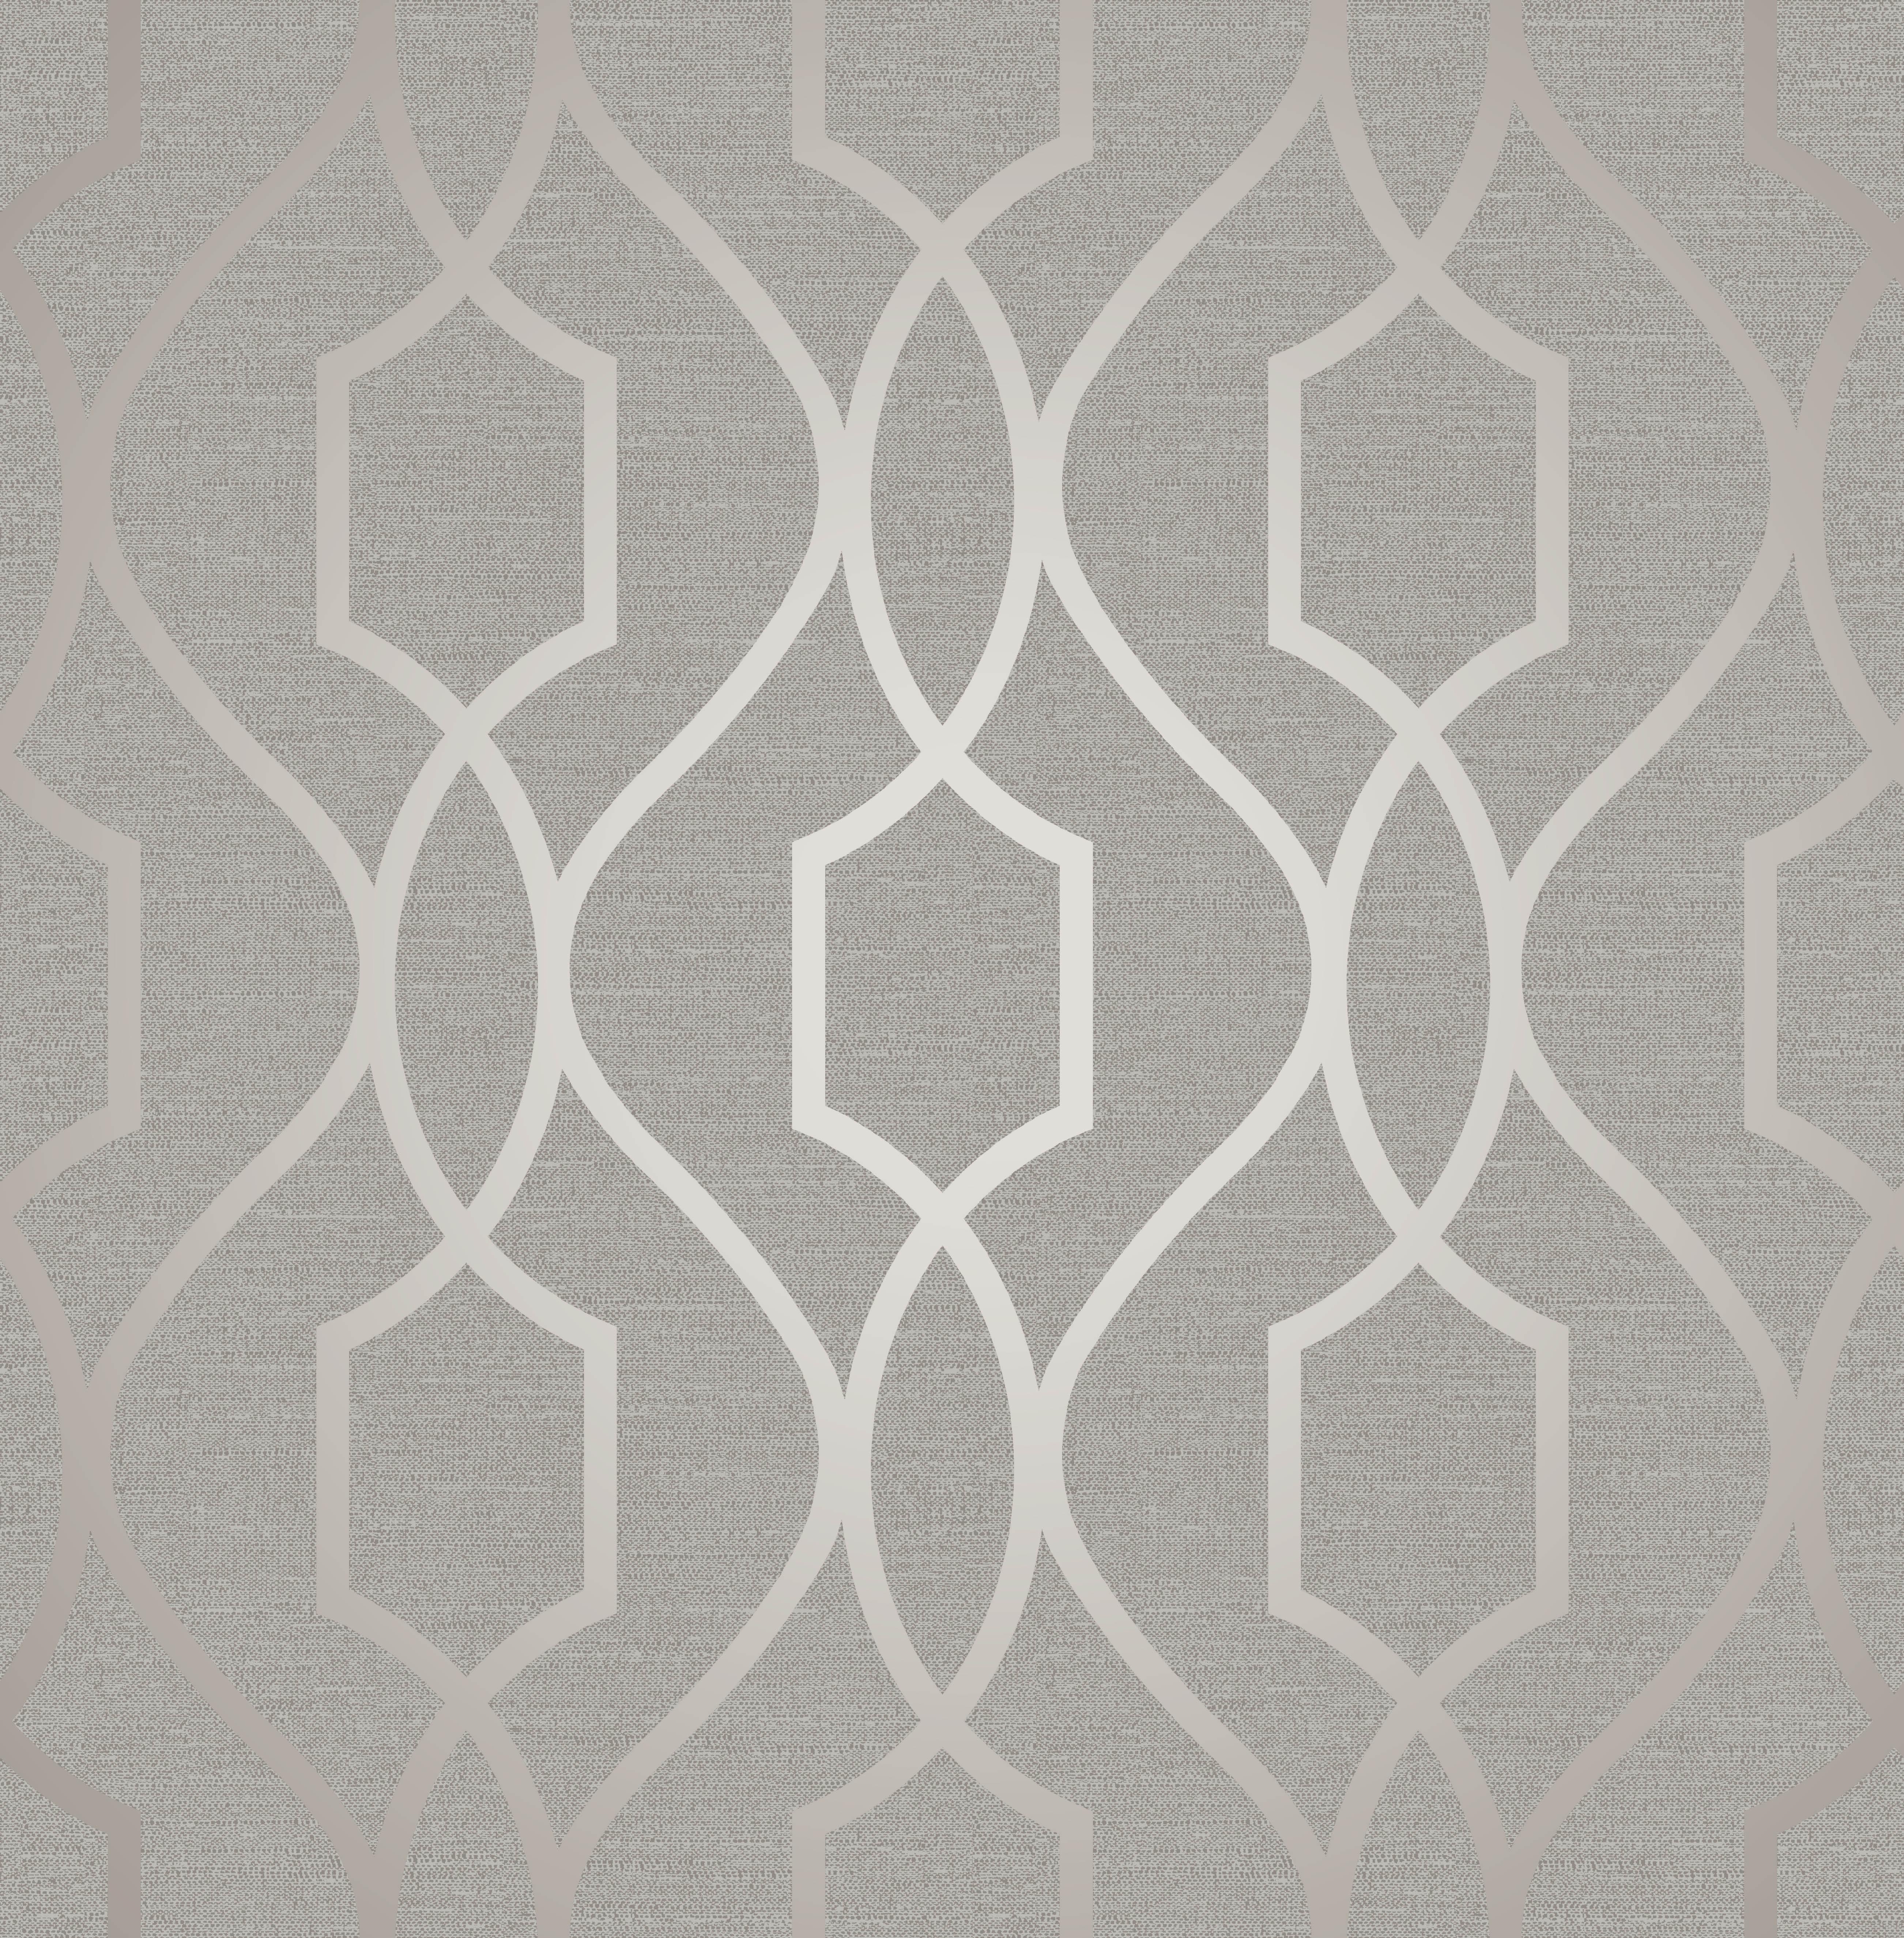 Details About Grey Taupe Geometric Wallpaper Metallic Shiny Apex 3d Modern Fine Decor